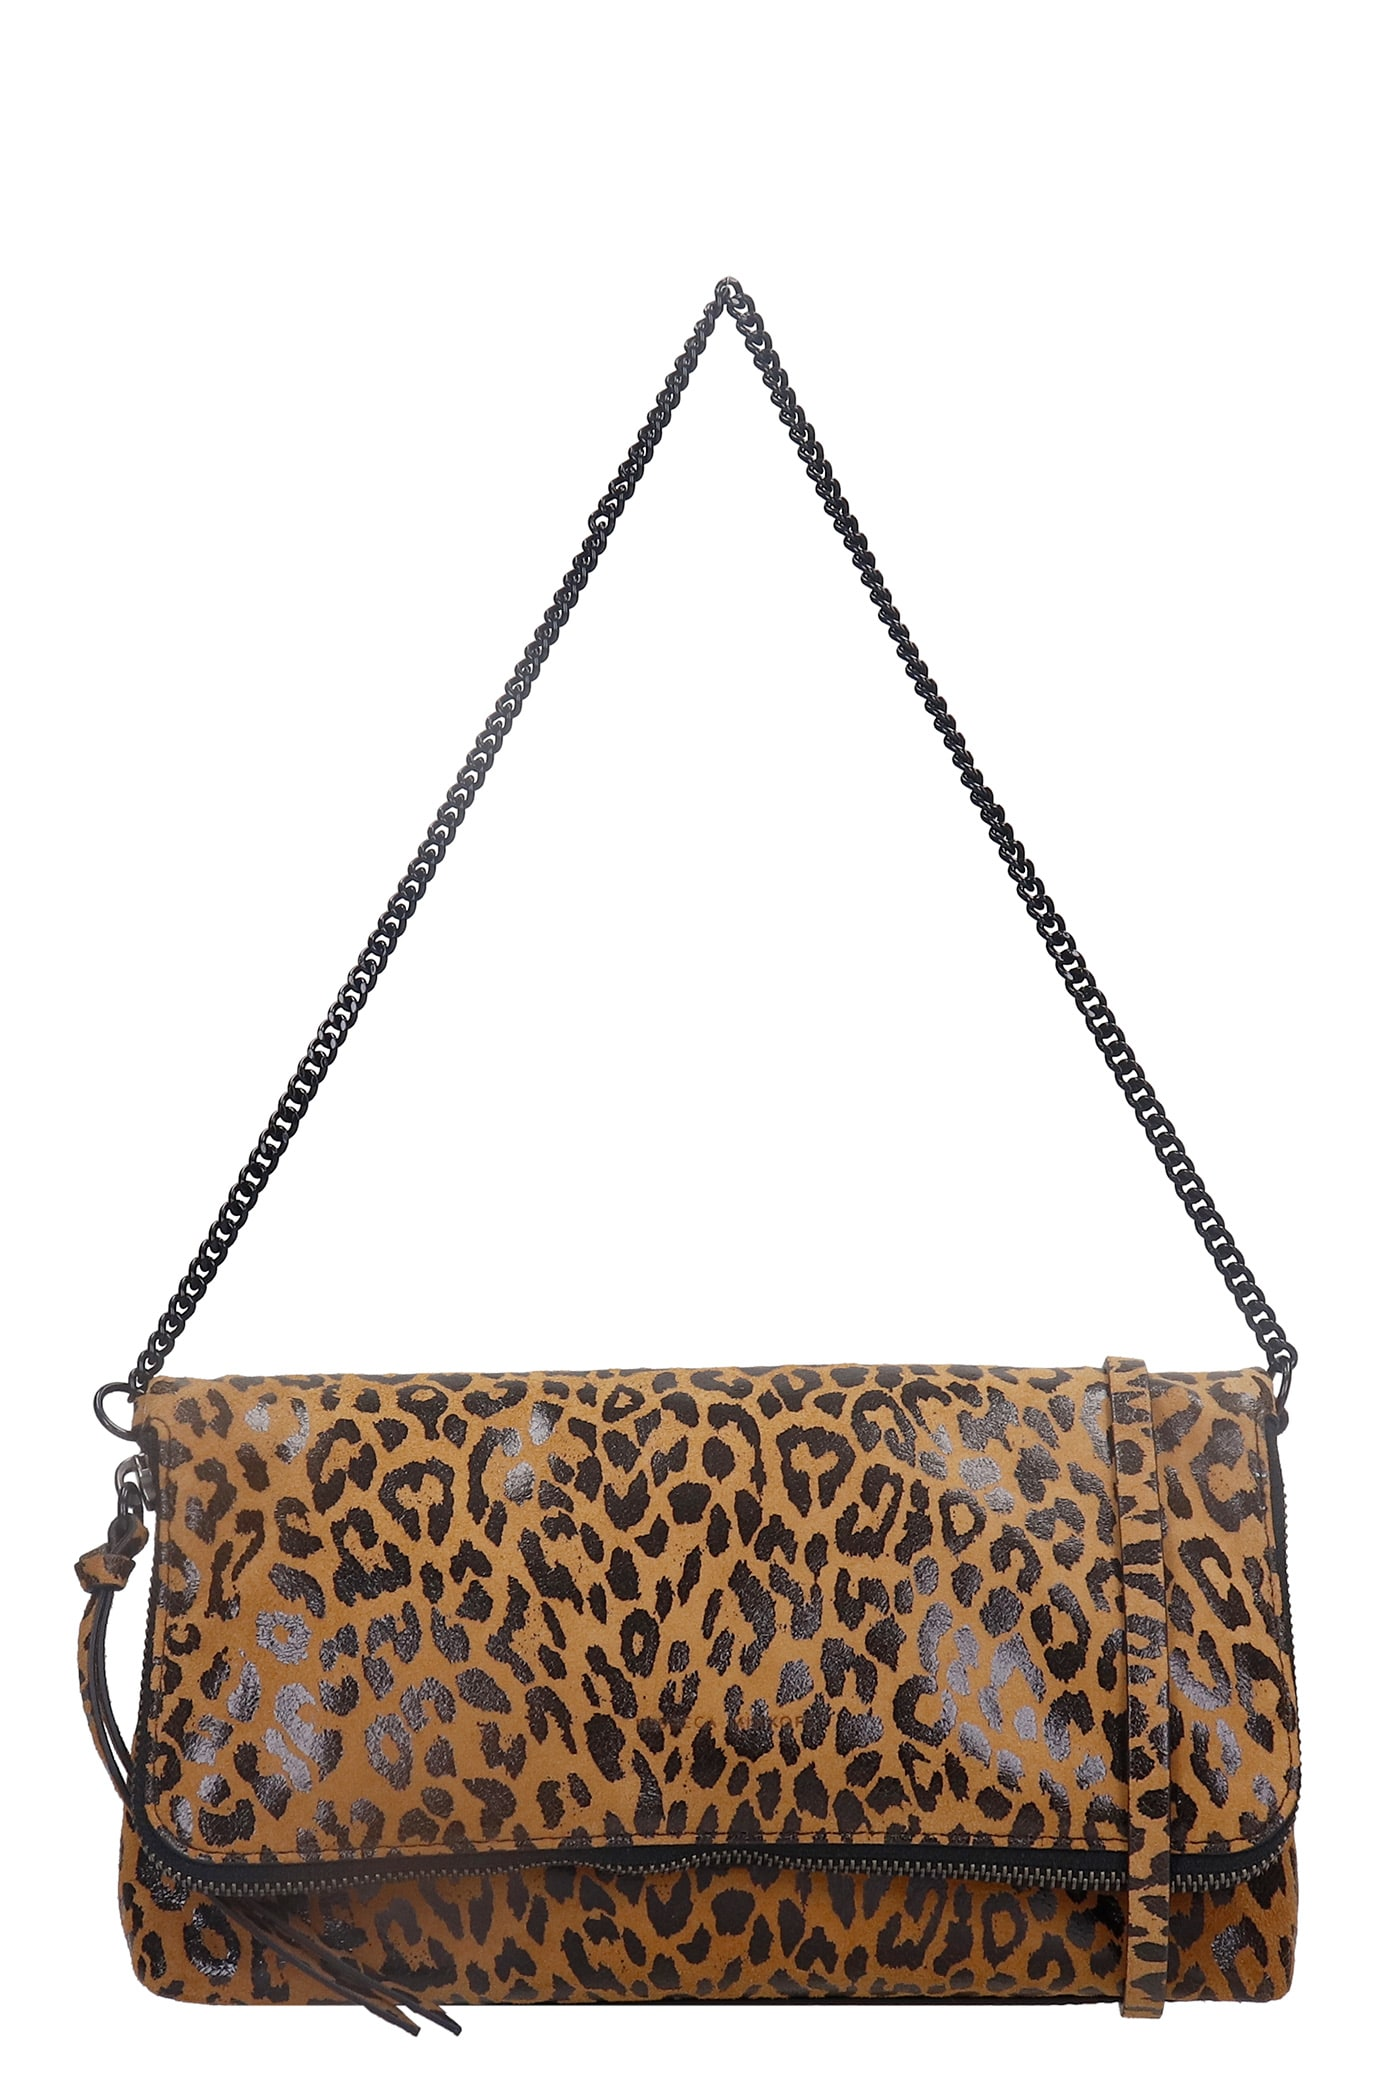 Rebecca Minkoff Date Conv Shoulder Bag In Animalier Leather